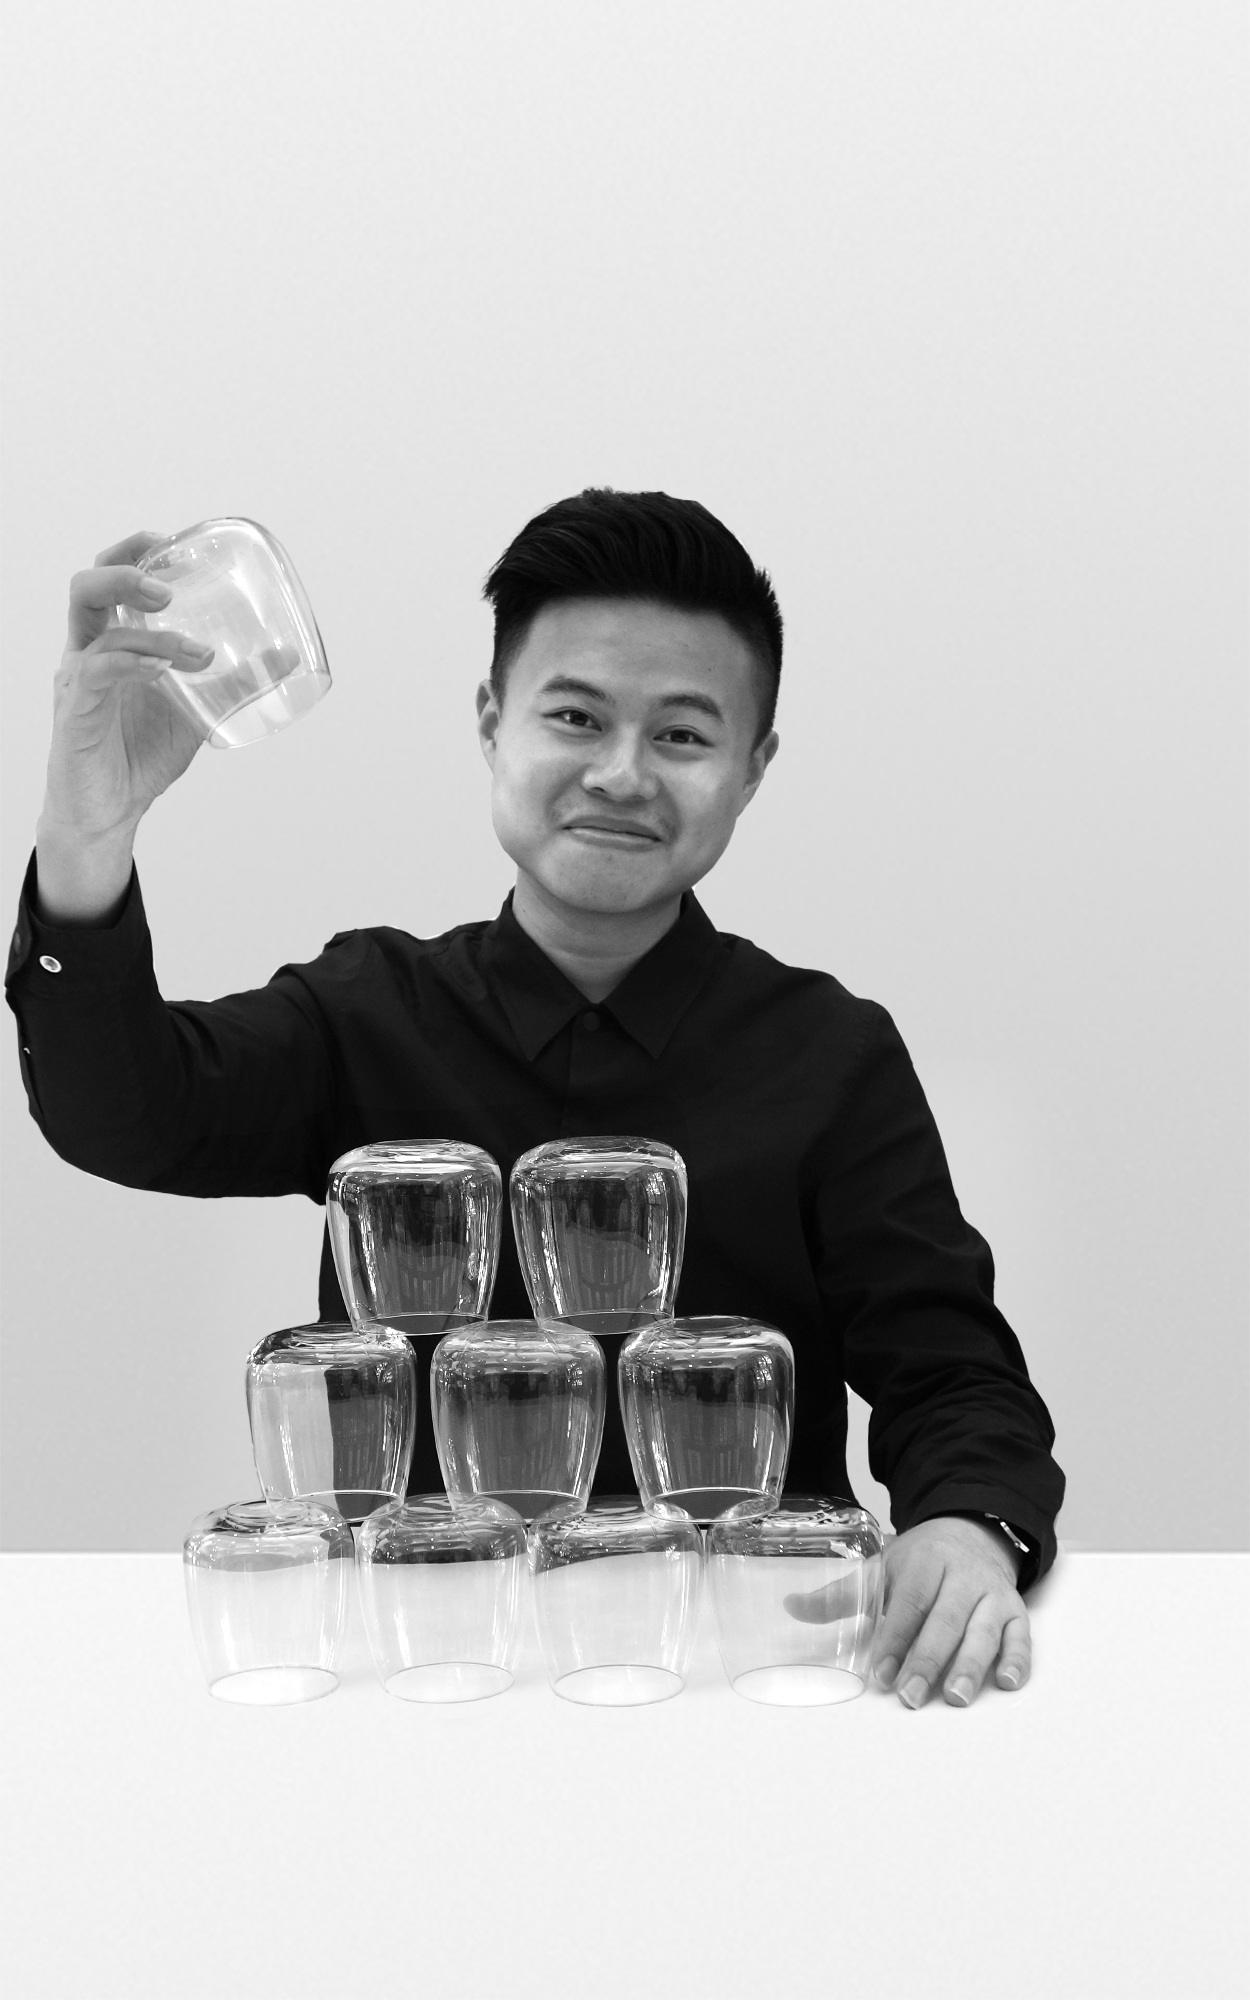 Chia-Yi (lan) Li